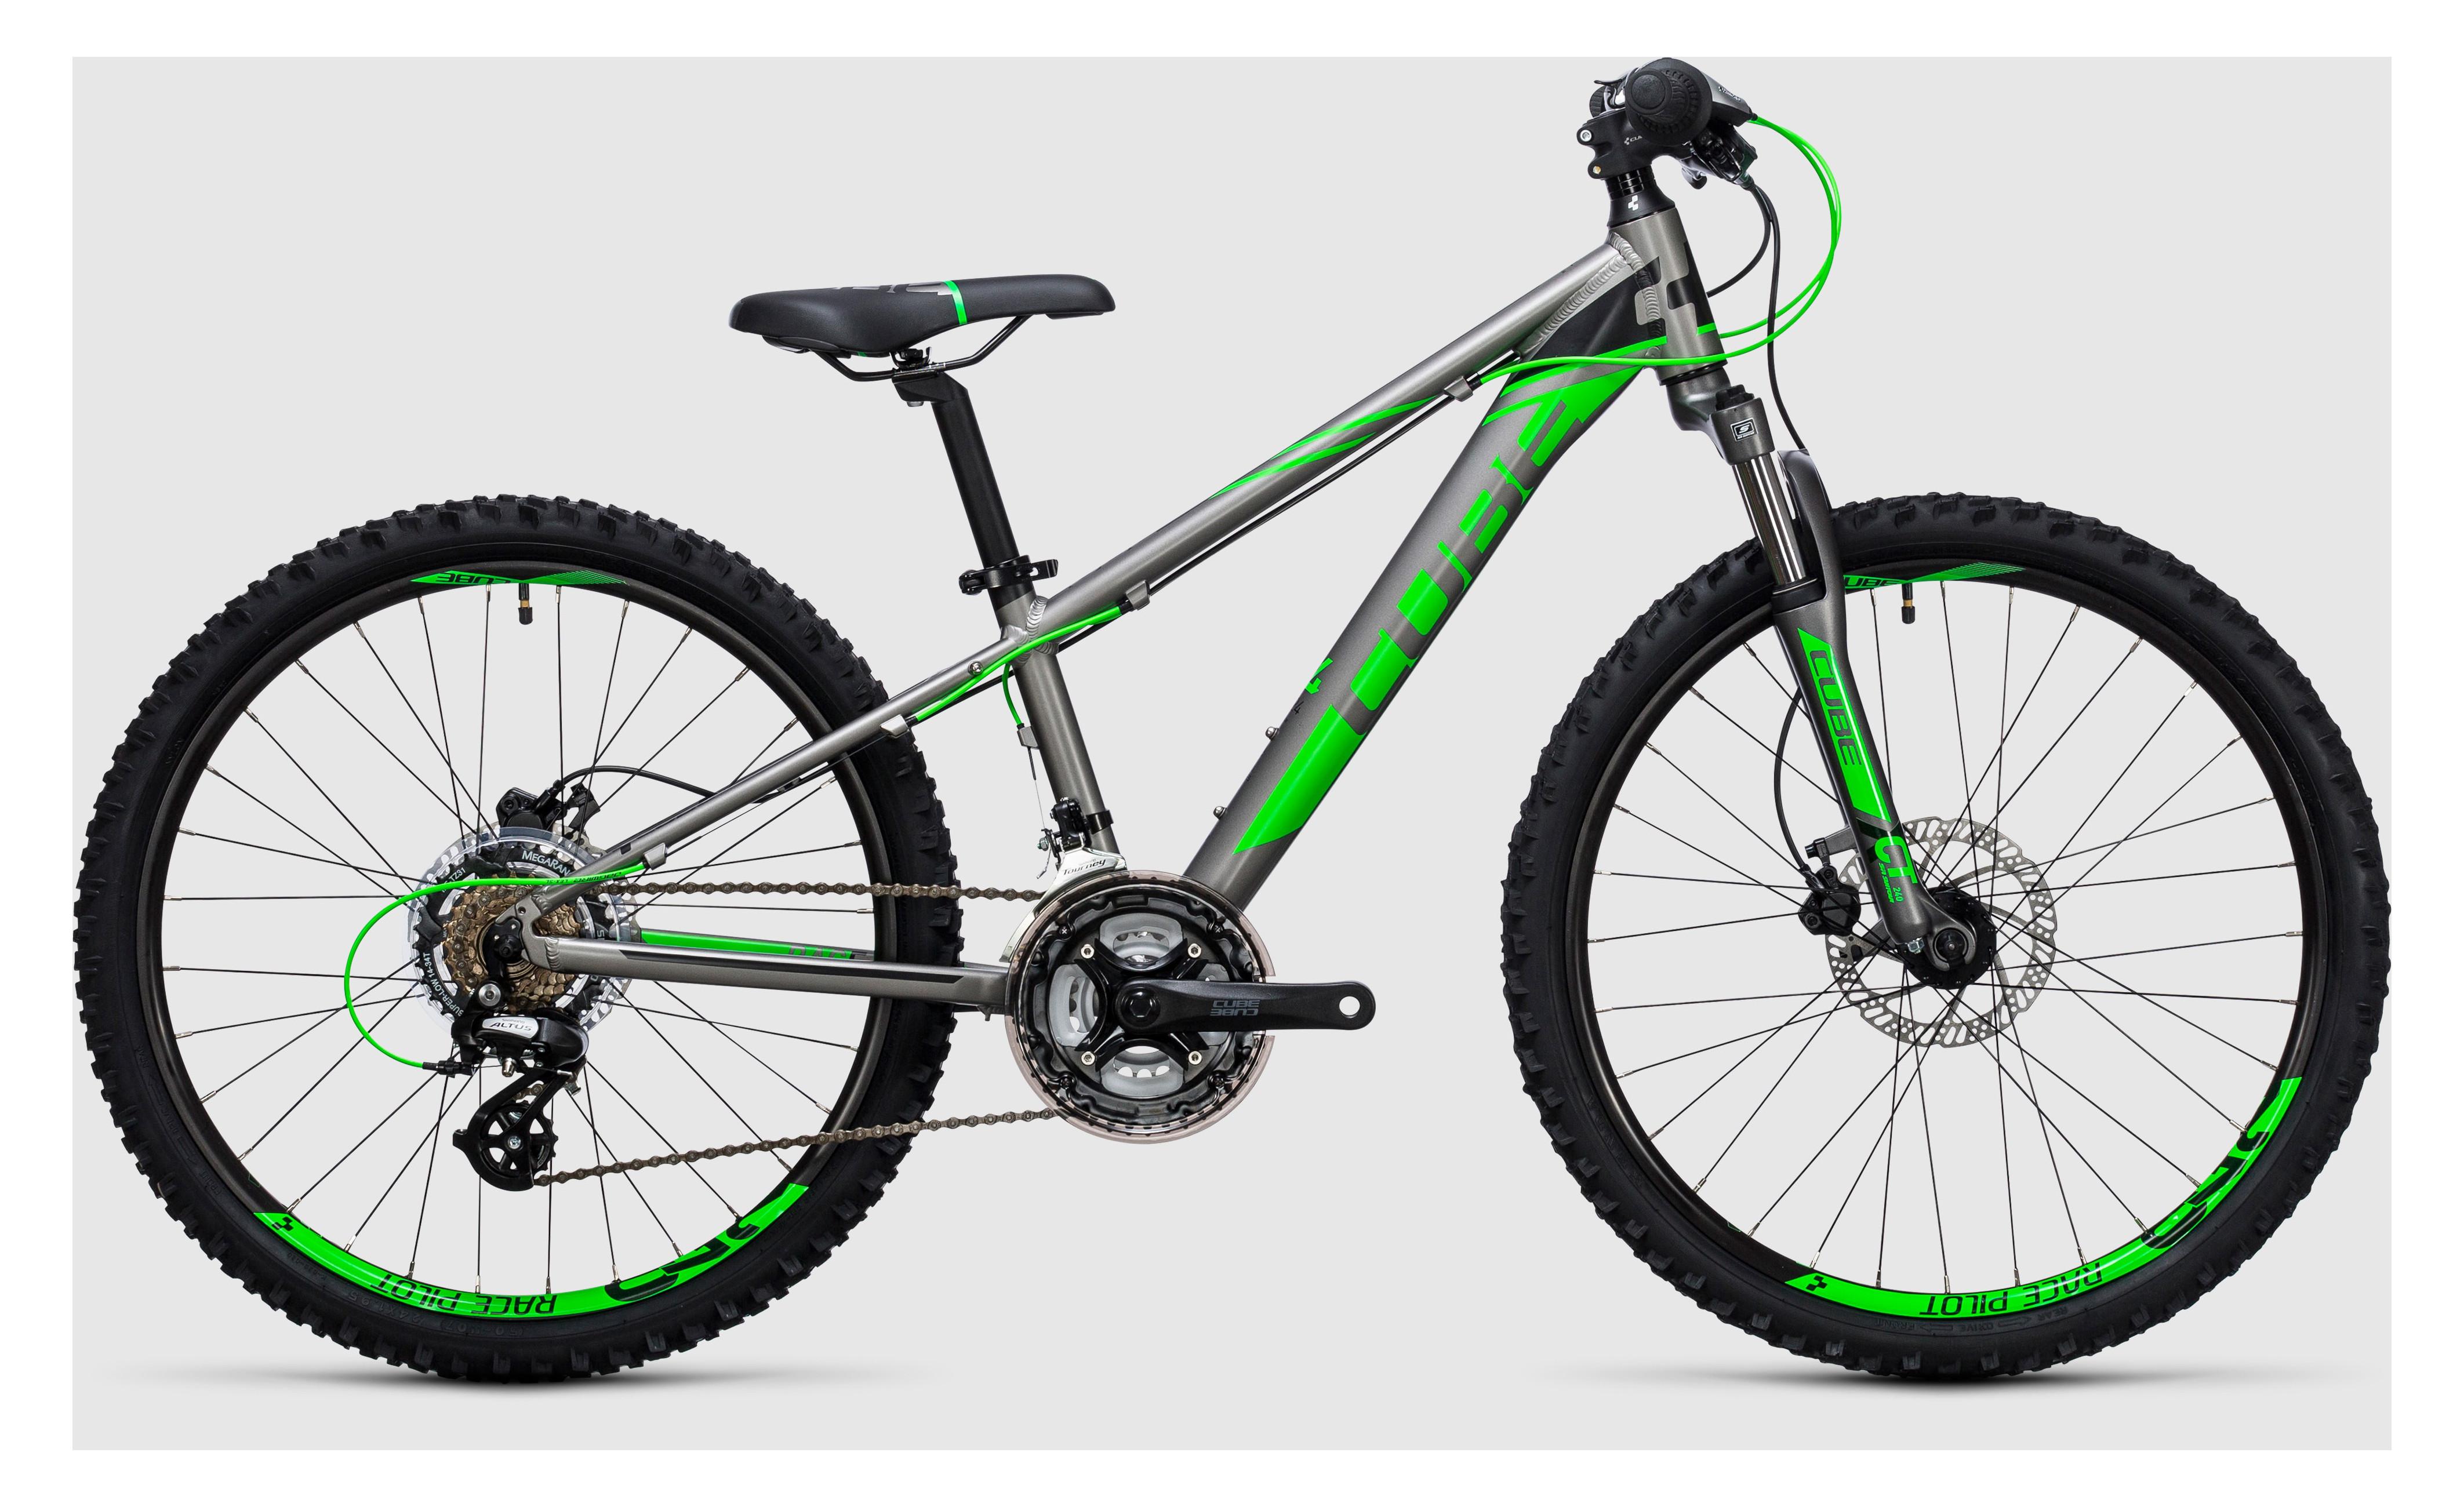 e982d6f5c83 Cube Kid 240 Disc Boys Bike 2017 Grey/Green £358.99